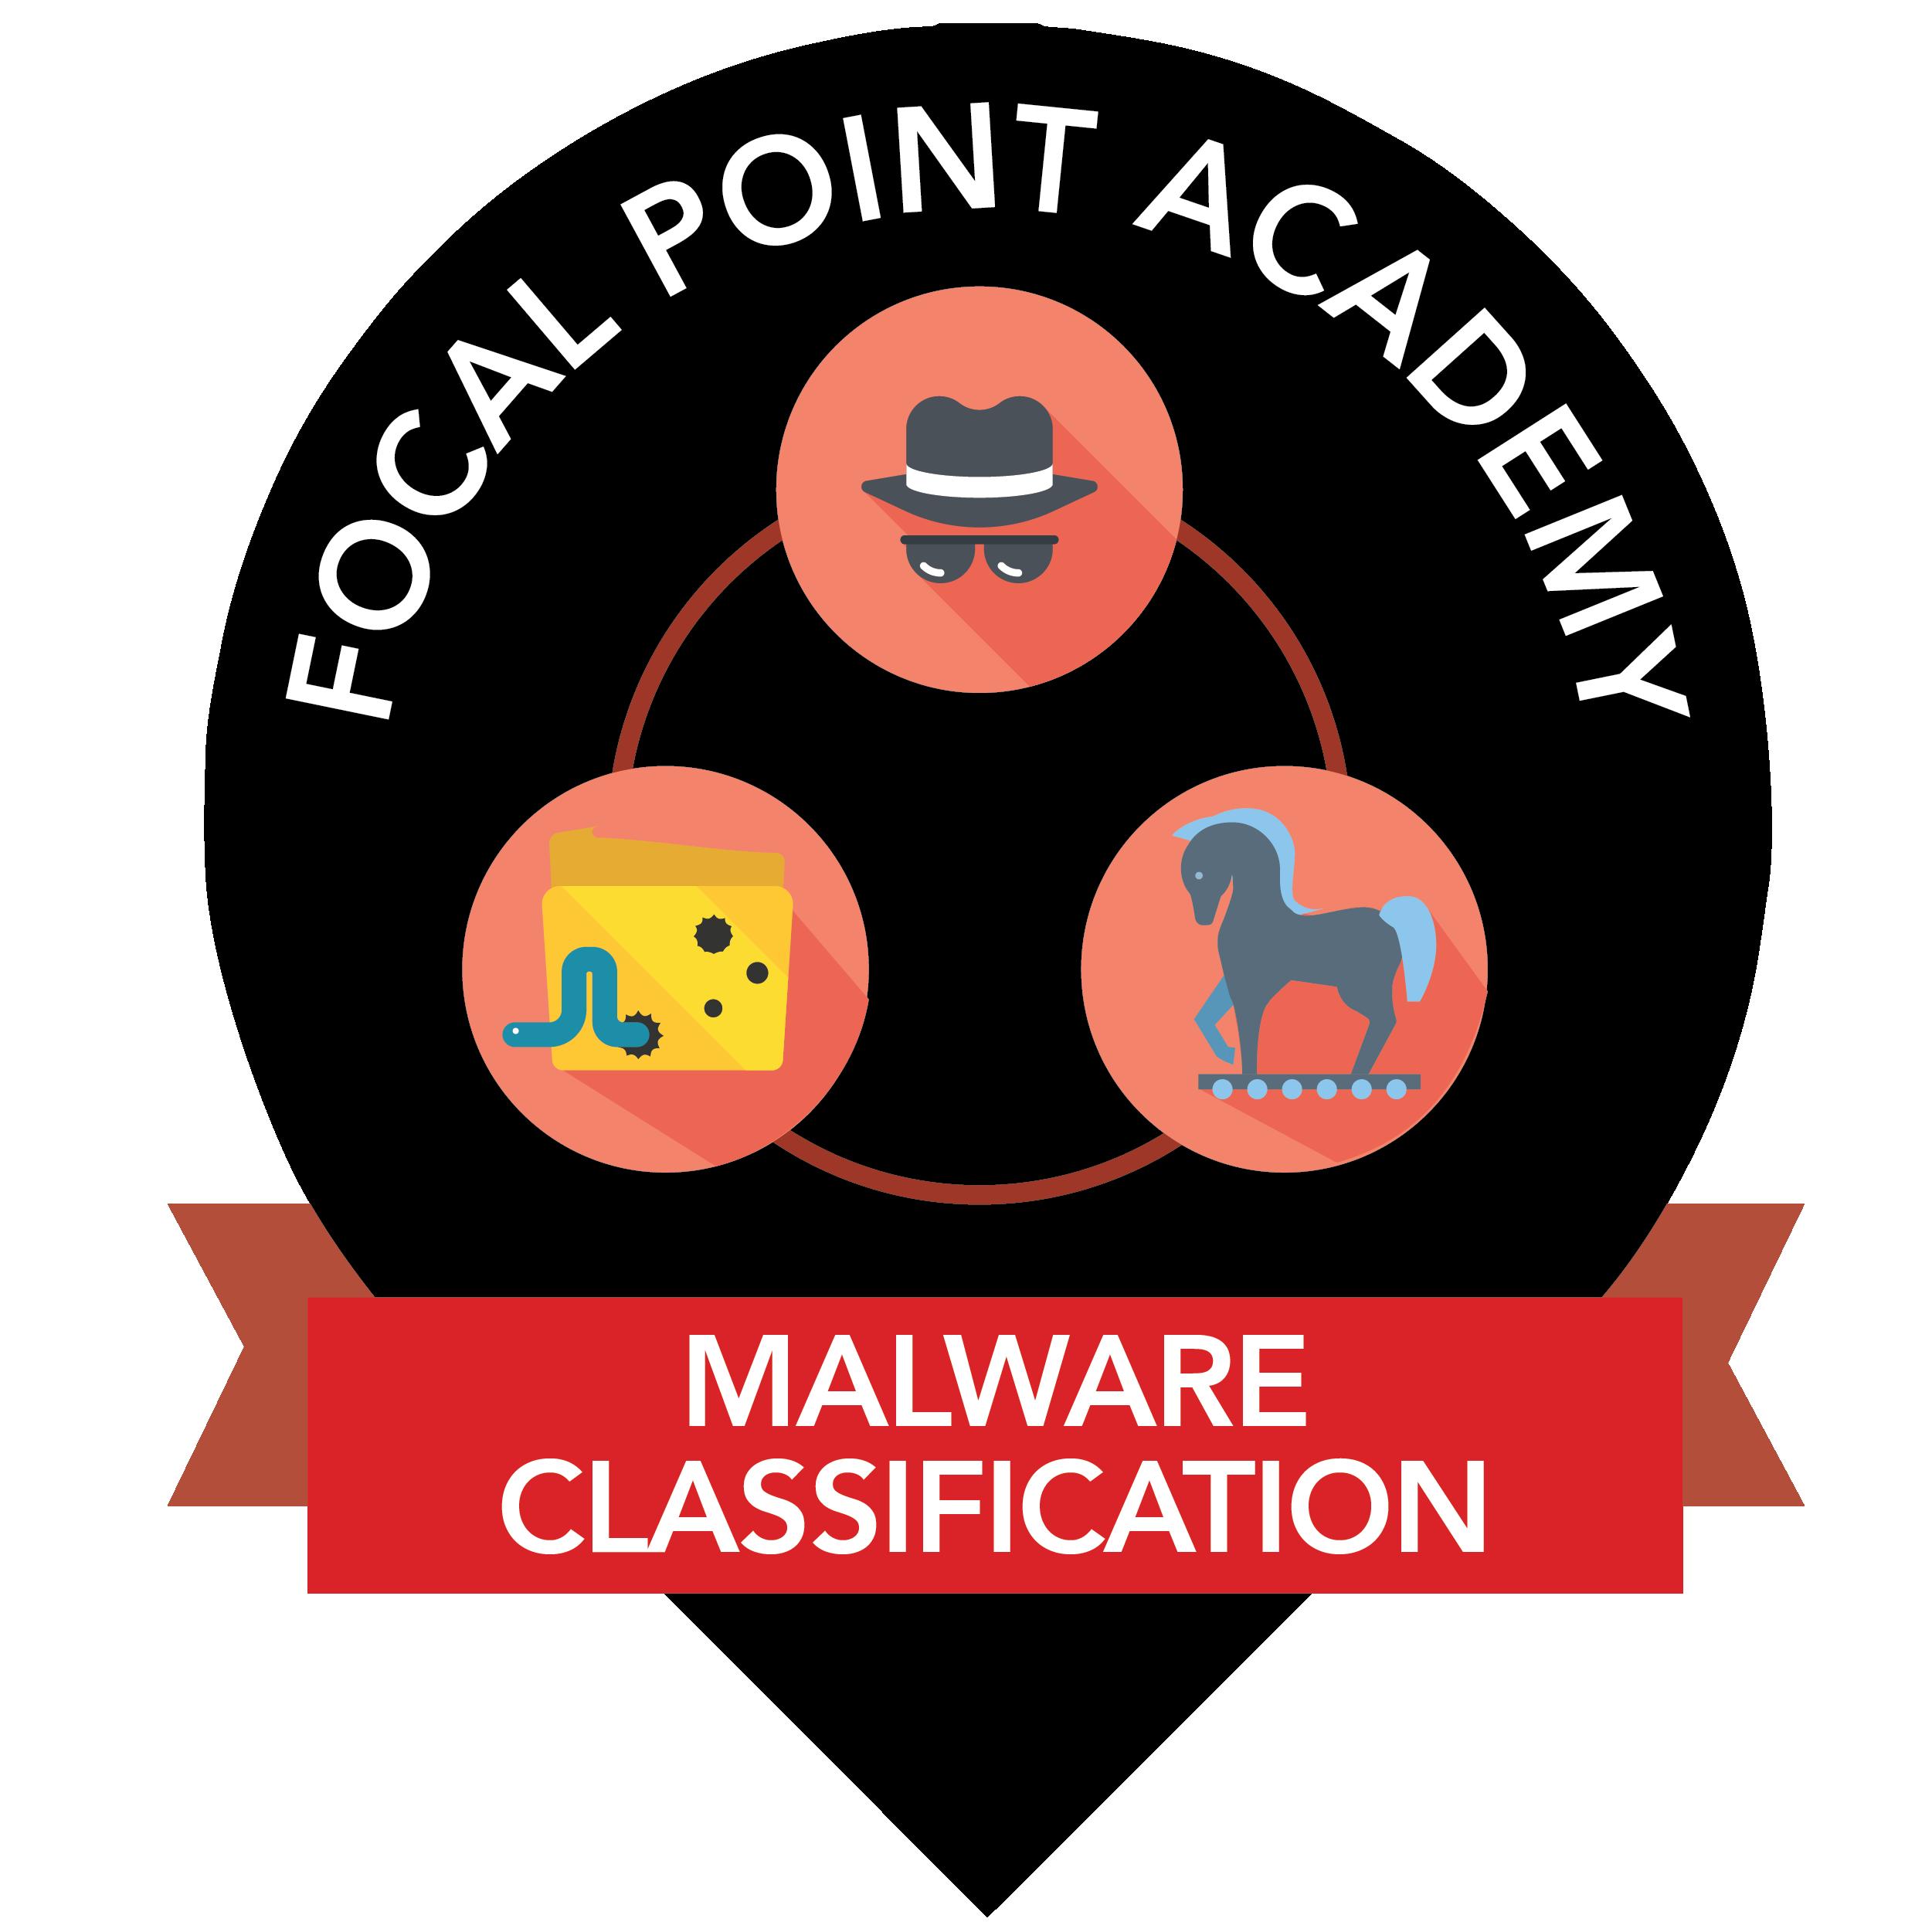 Malware Classification